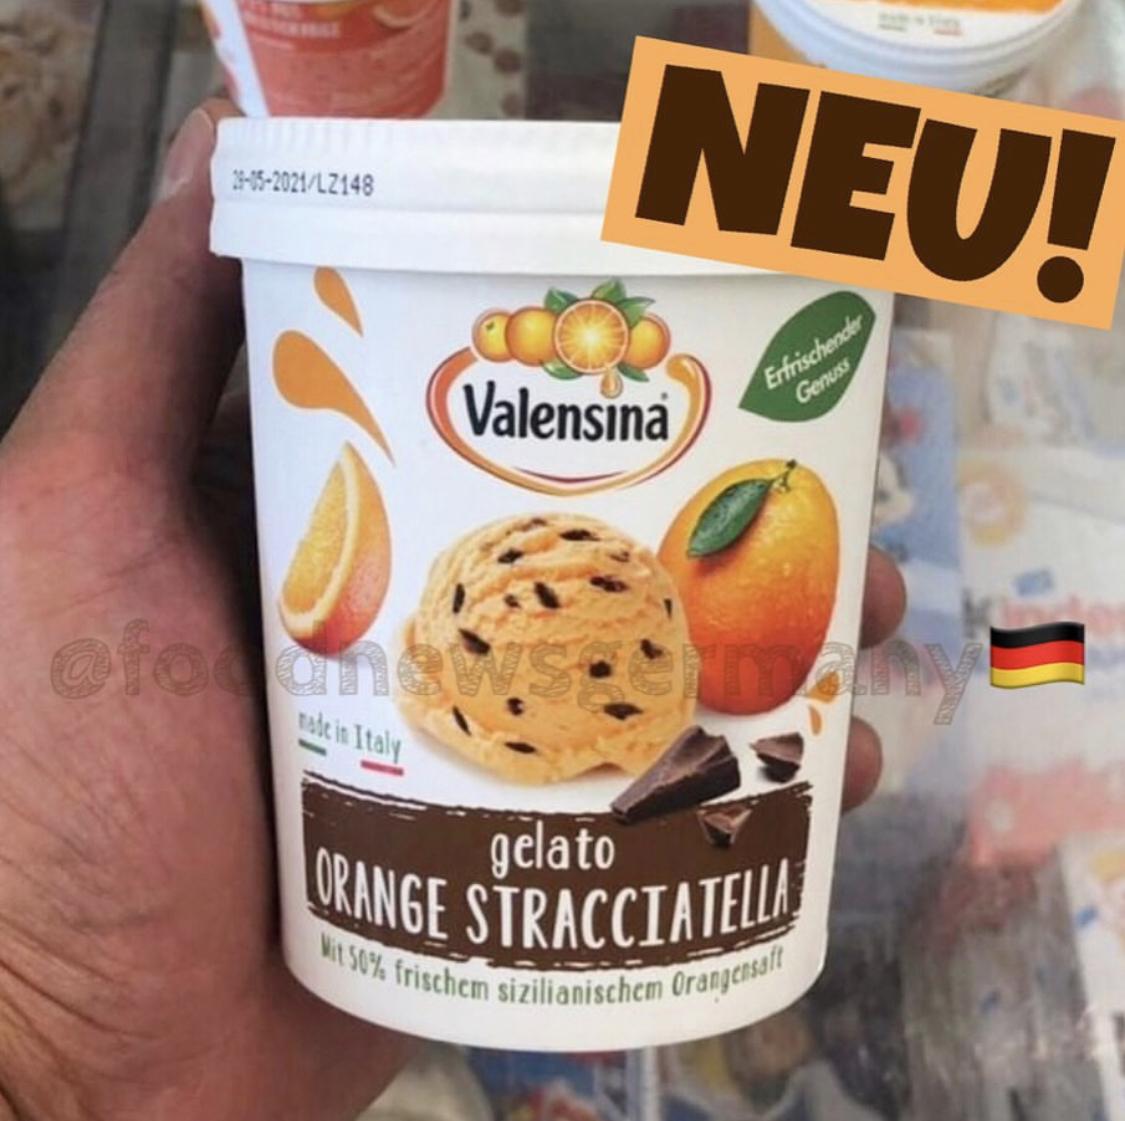 Valensina Eis Gelato Orange Stracciatella